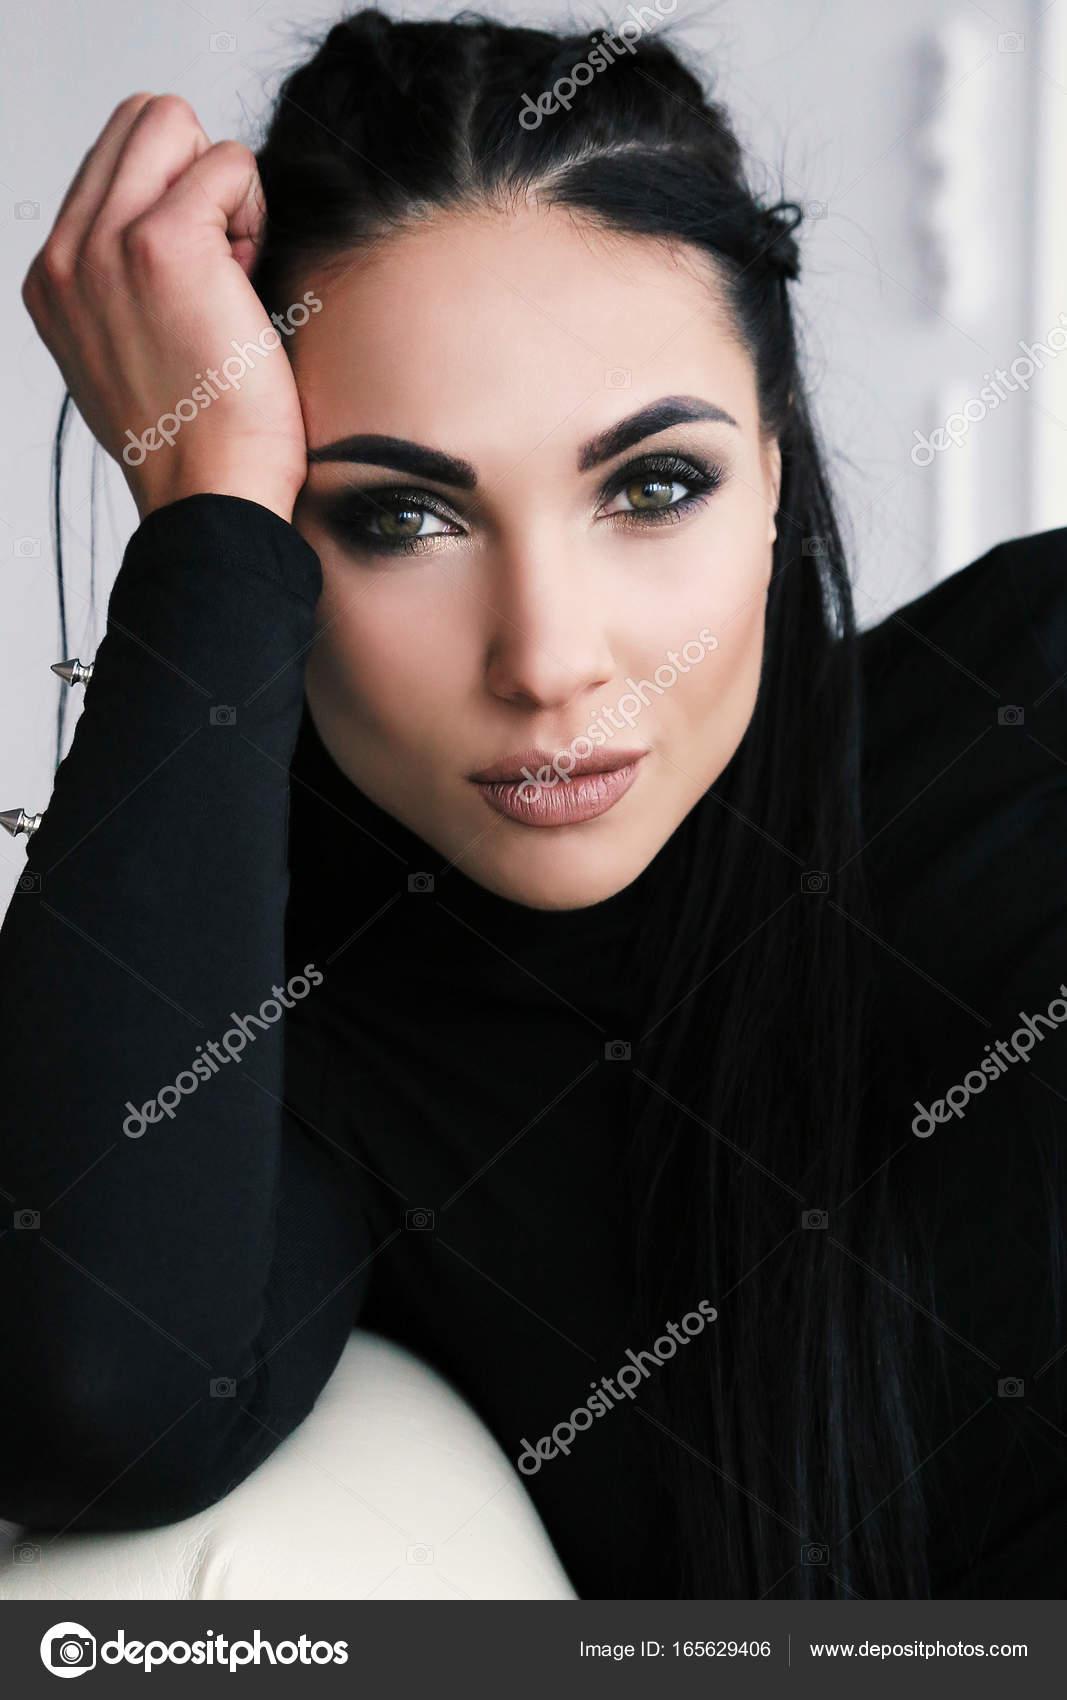 c7d216f7dba σέξι γυναίκα με σκούρα μαλλιά σε sportive ρούχα — Φωτογραφία Αρχείου ...